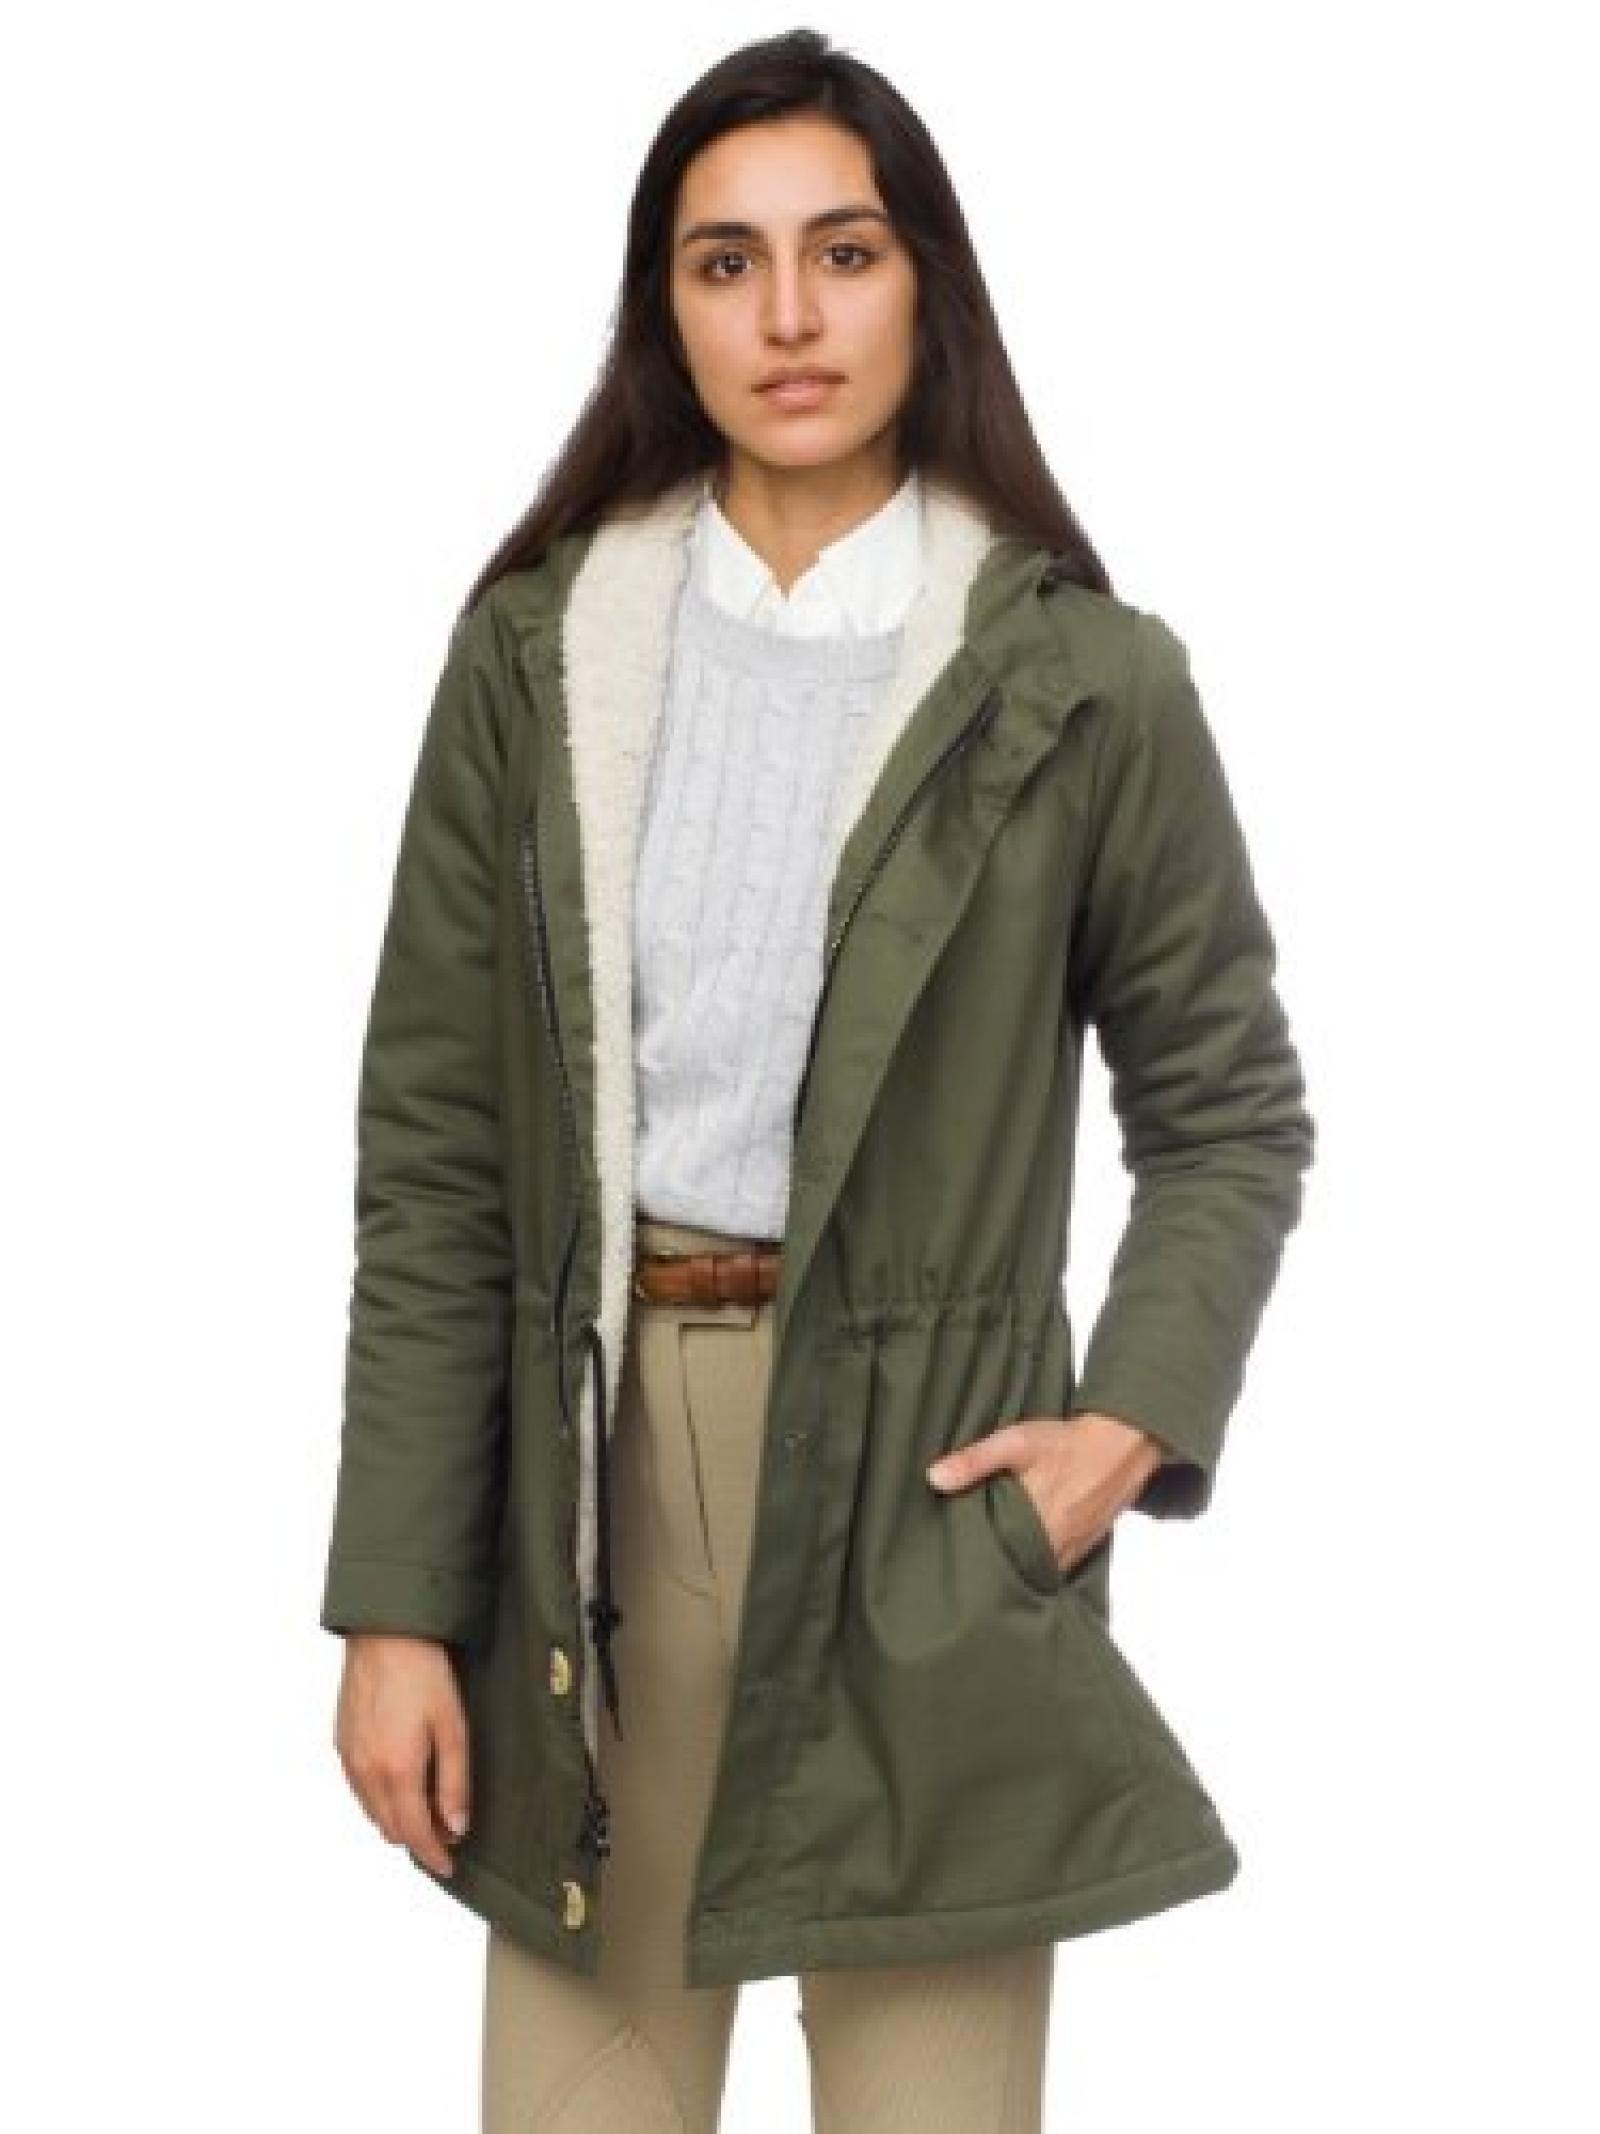 American Apparel Winter Jacket